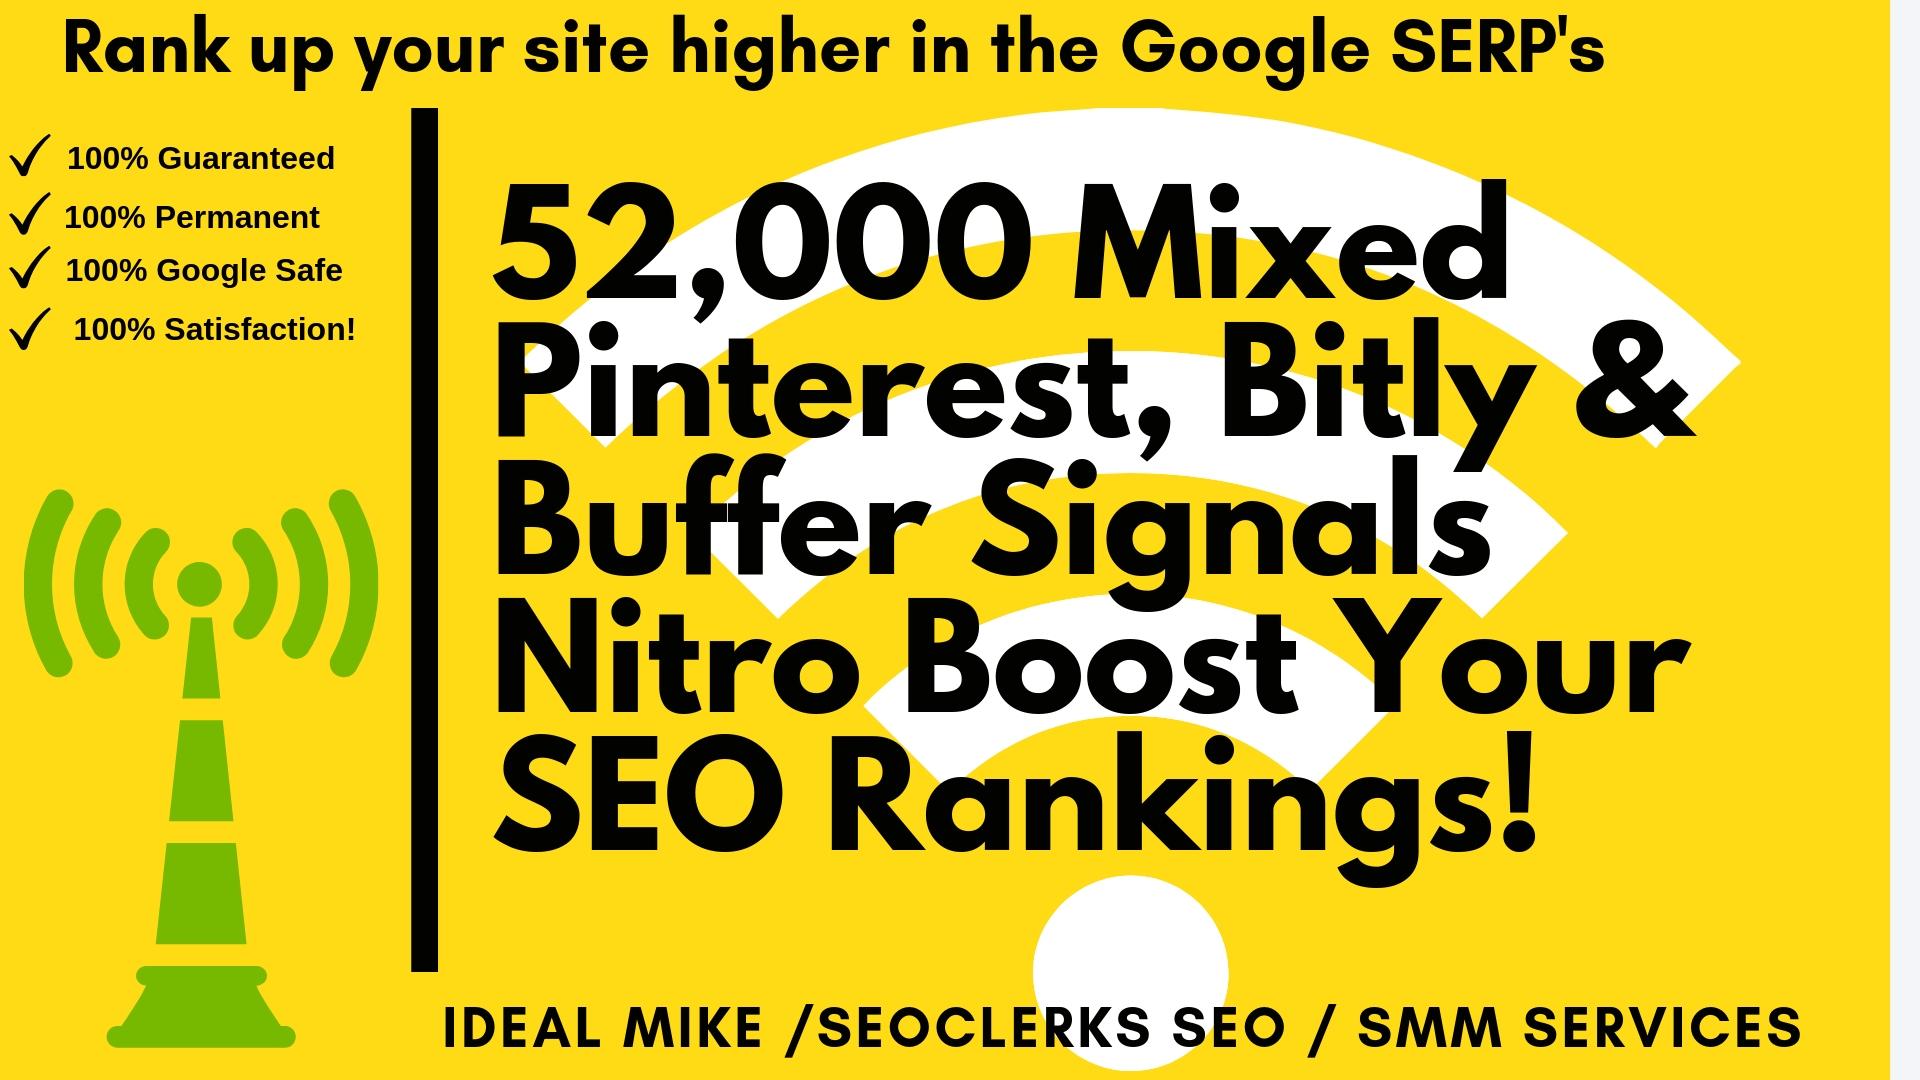 52,000 Mixed Pinterest Bitly & Buffer Social Signals Nitro Boost Your SEO Rankings